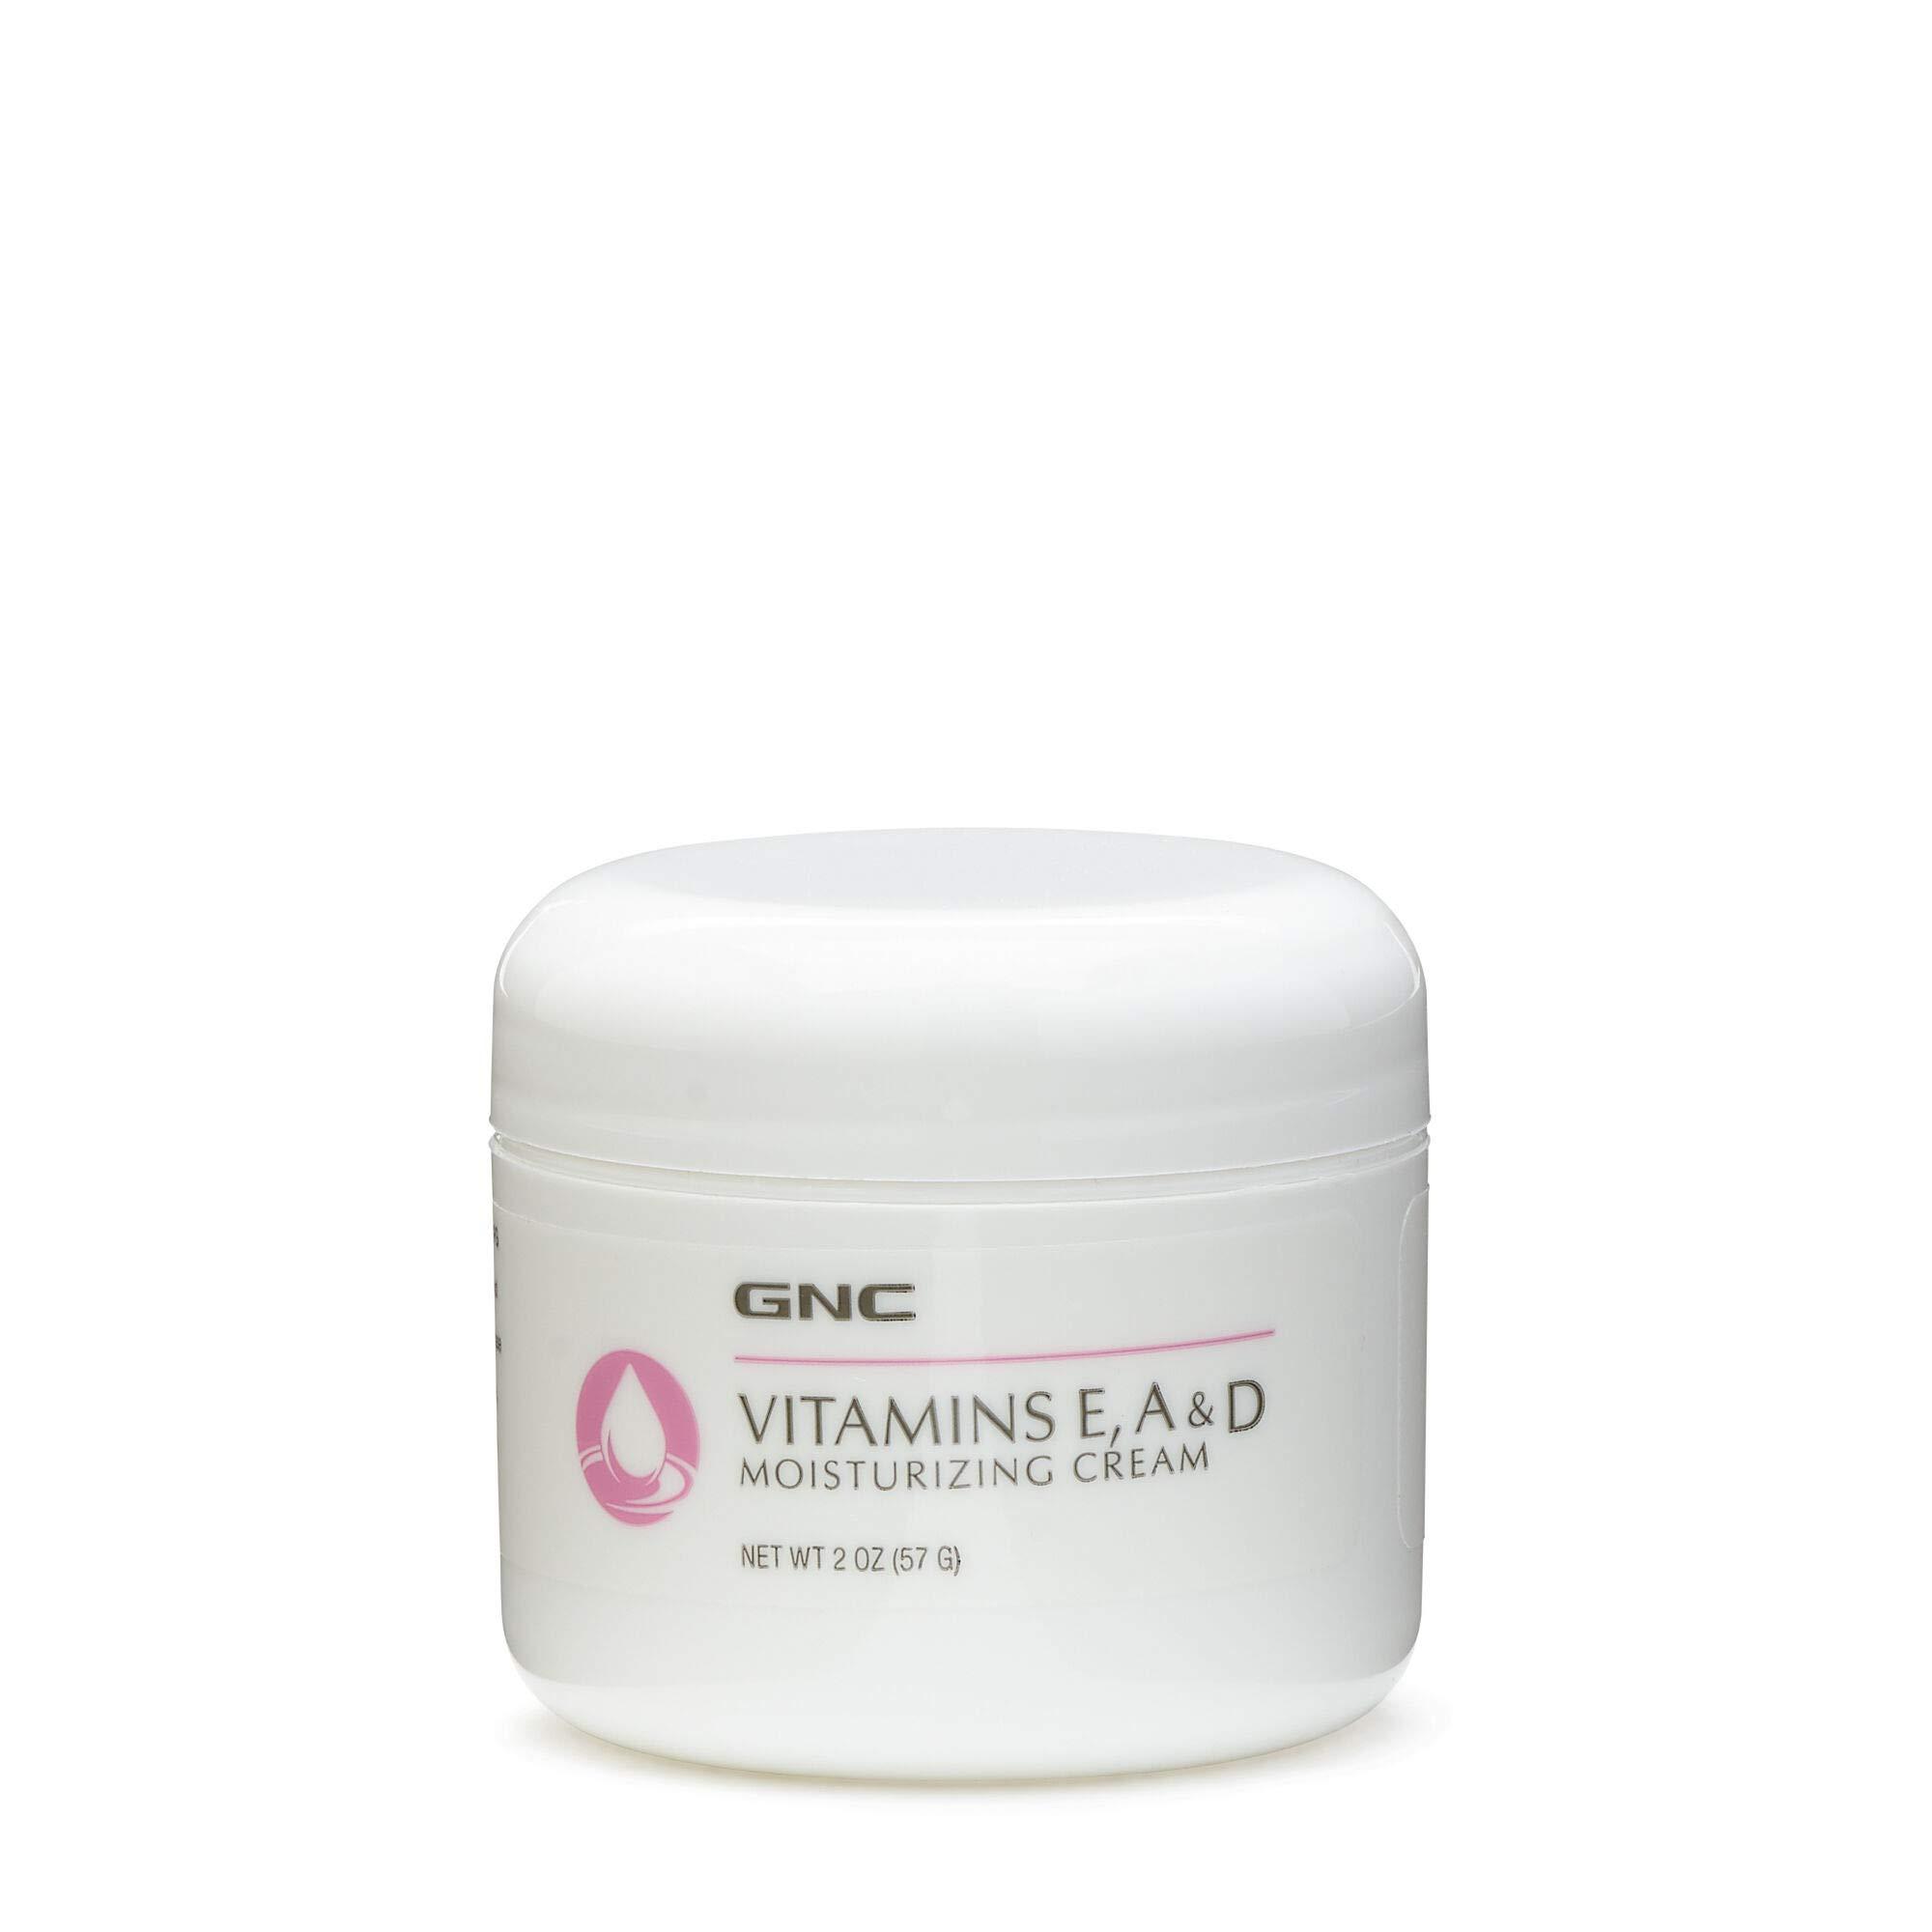 GNC Vitamins E, A & D Moisturizing Cream 2oz, Soothes Dry, Chapped Skin